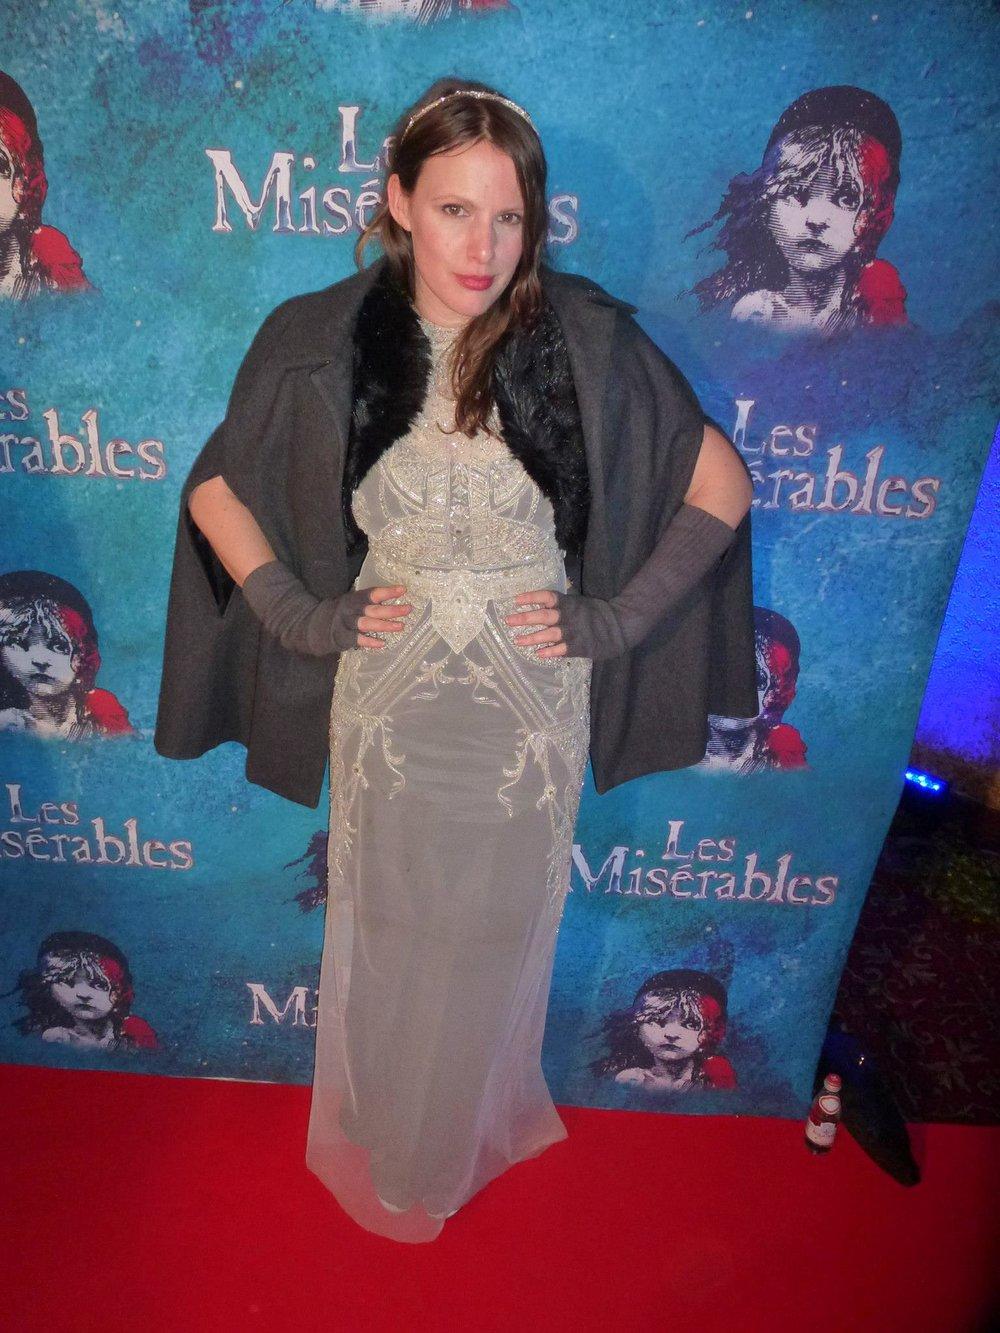 Gwendolynne Burkin and Richard Nylon Les Miserables .jpg